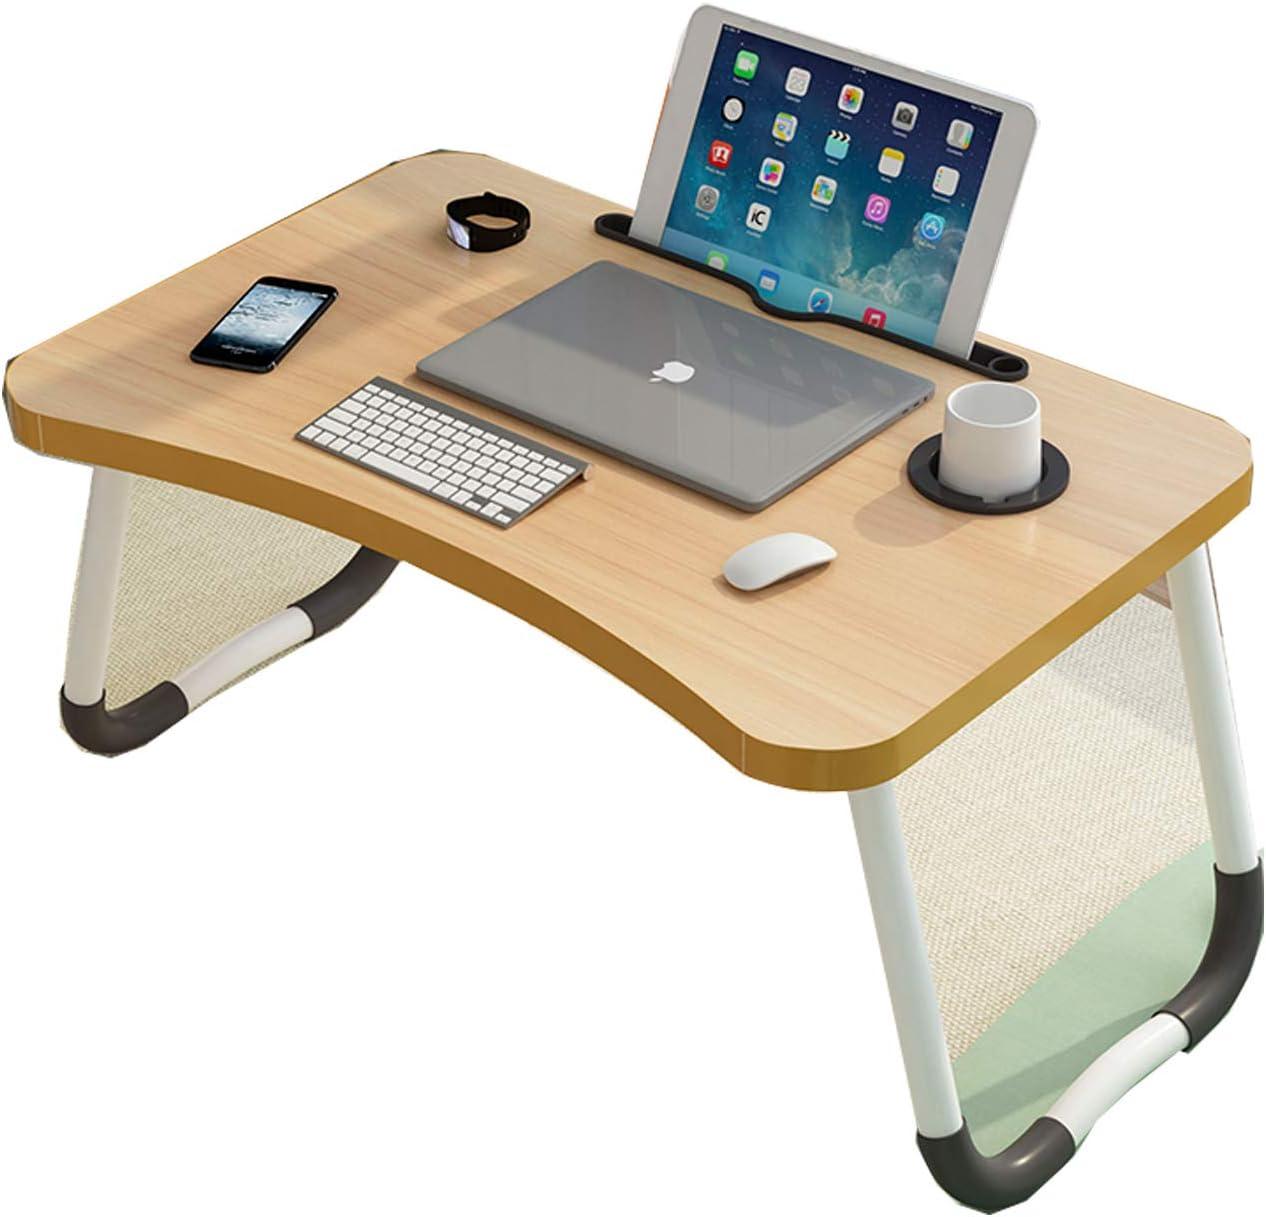 Foldable Lap Desk Portable Genuine Free Shipping S Choice Breakfast Folding Standing